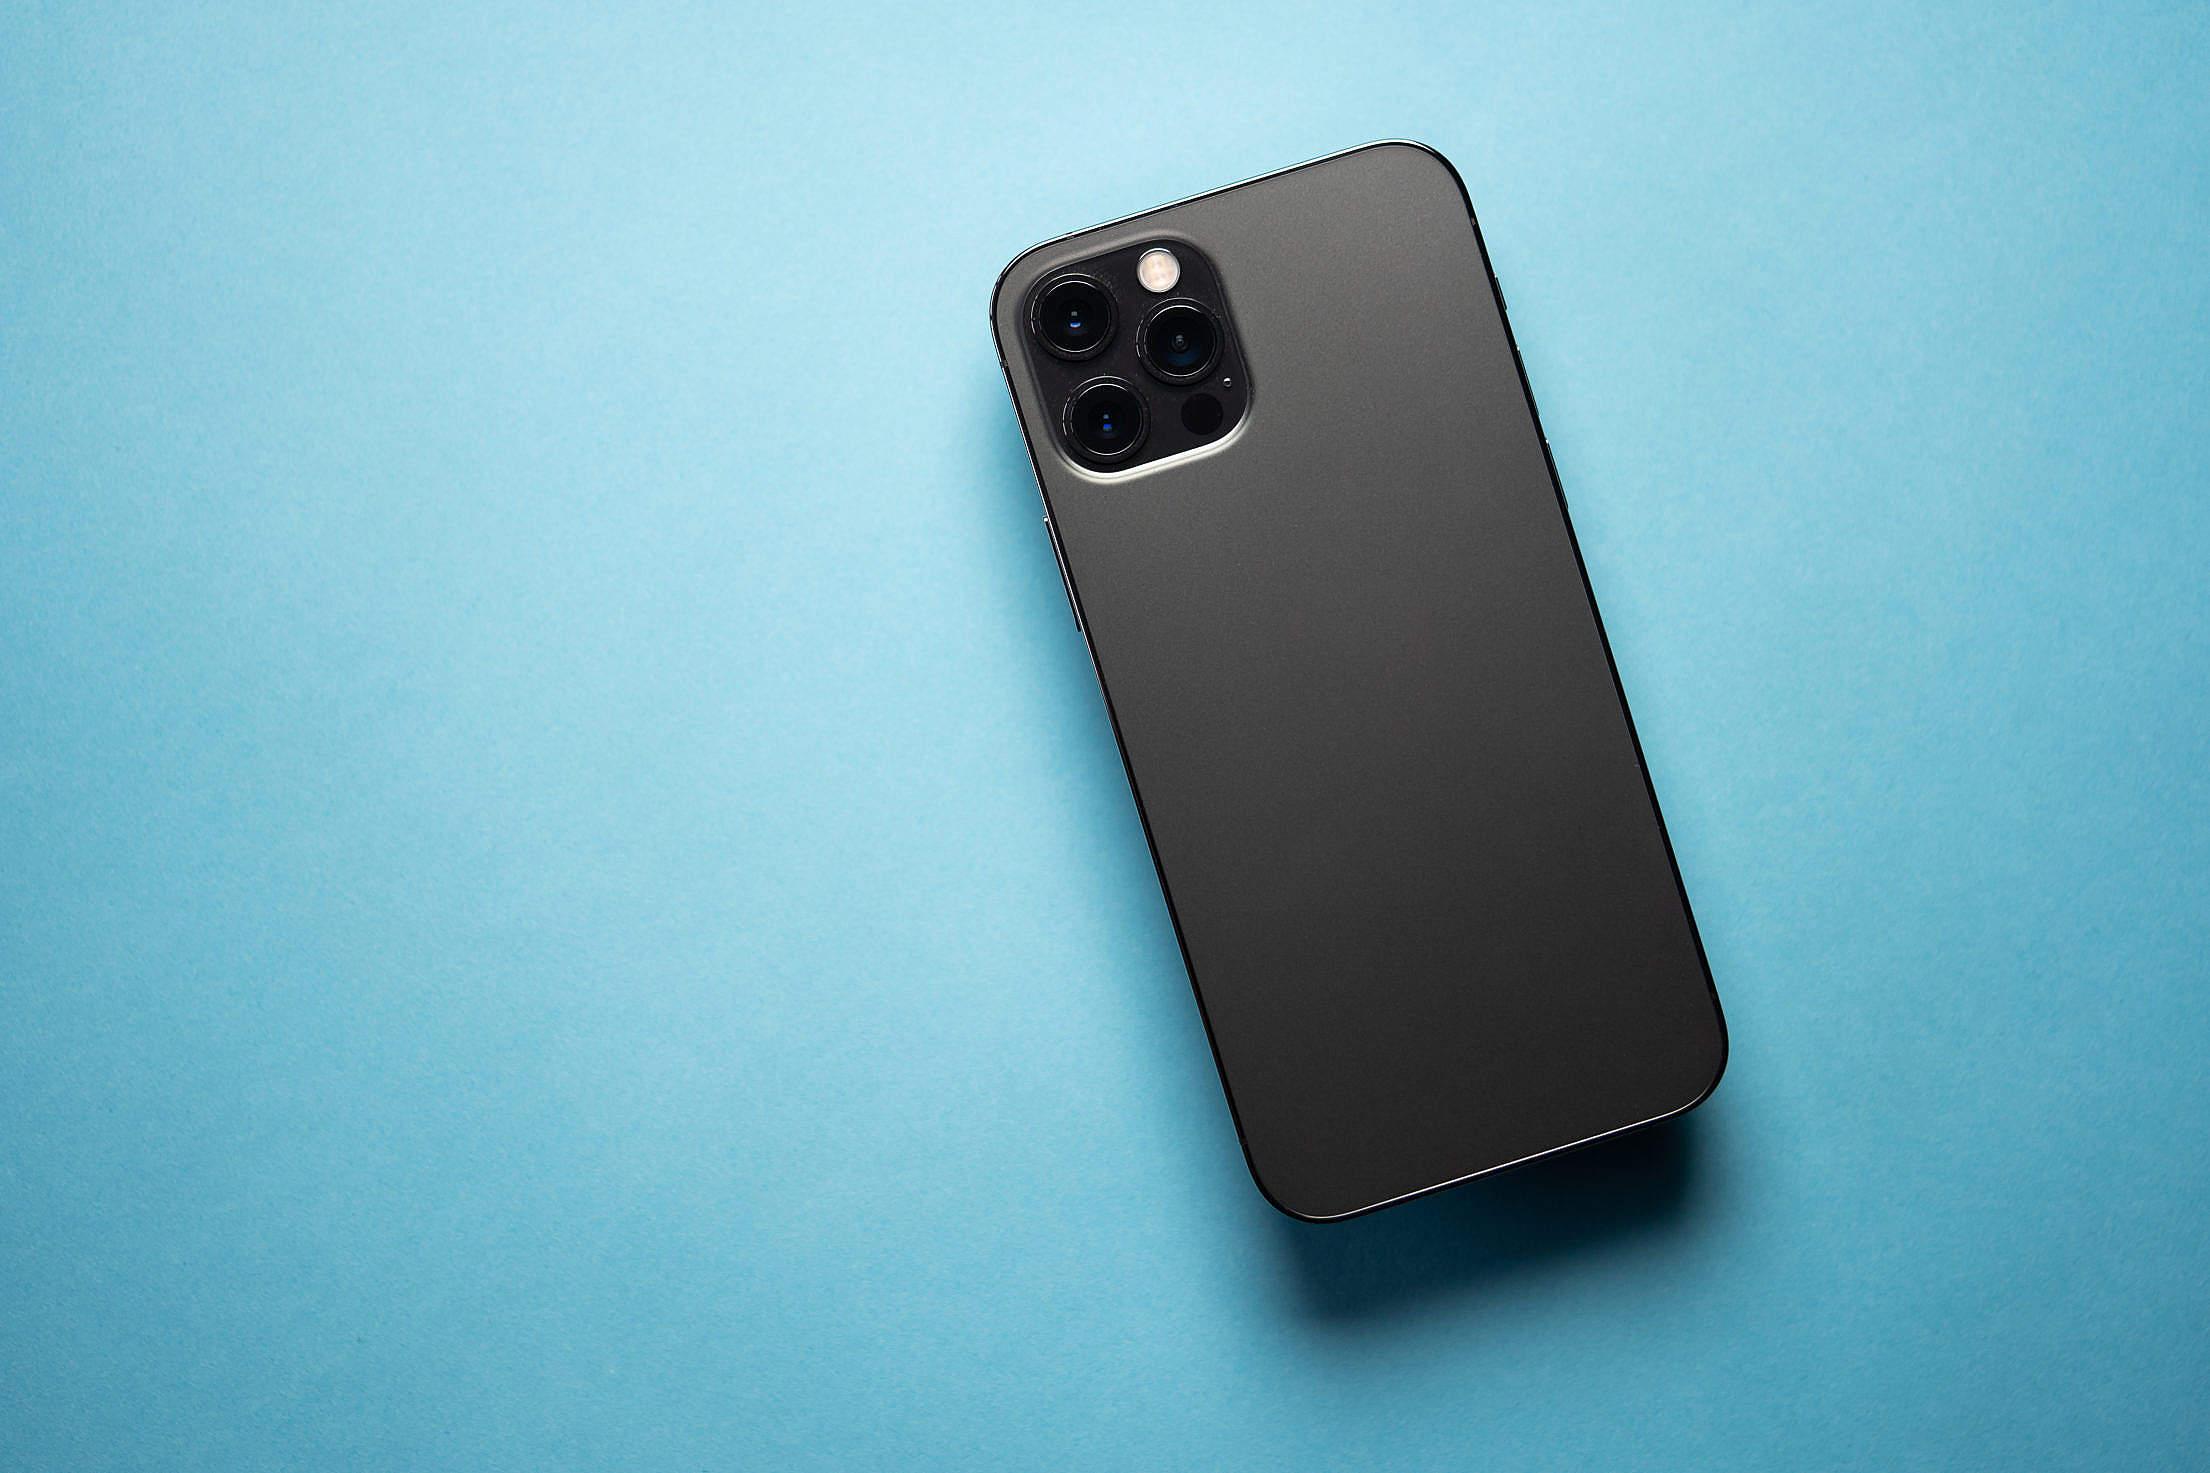 Modern Smartphone Without Brand Logo Free Stock Photo